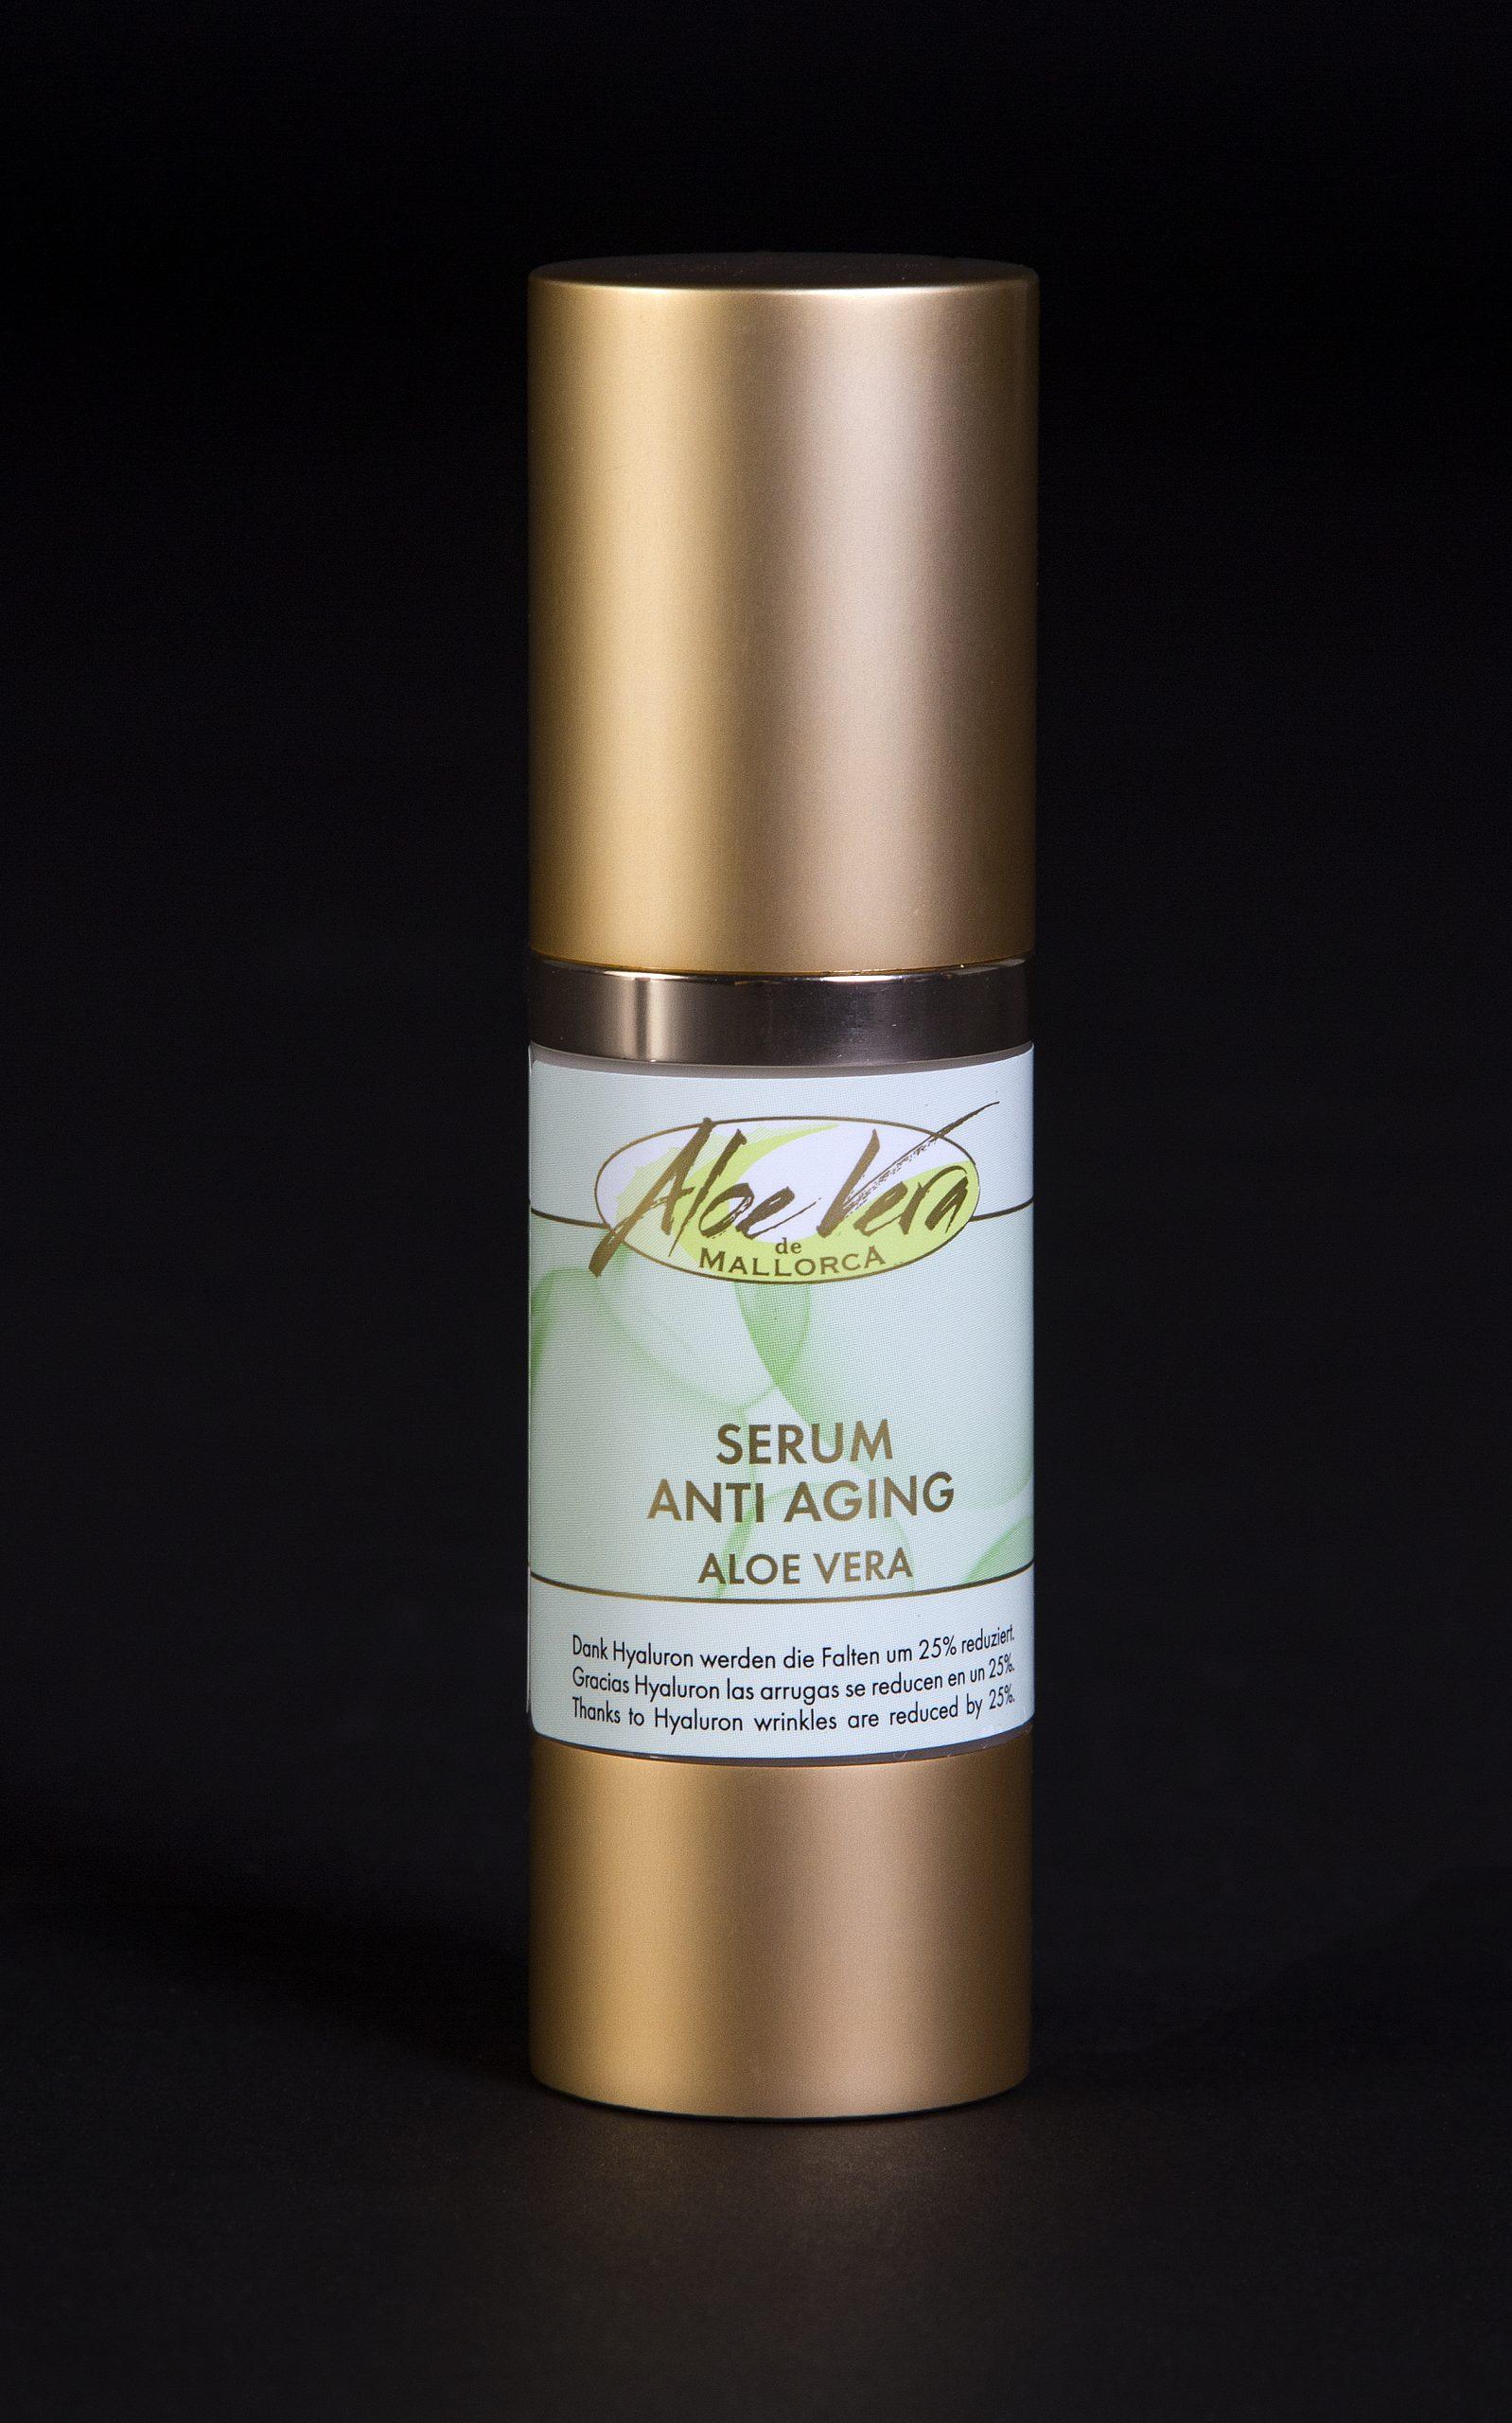 Aloe Vera Anti Aging Serum